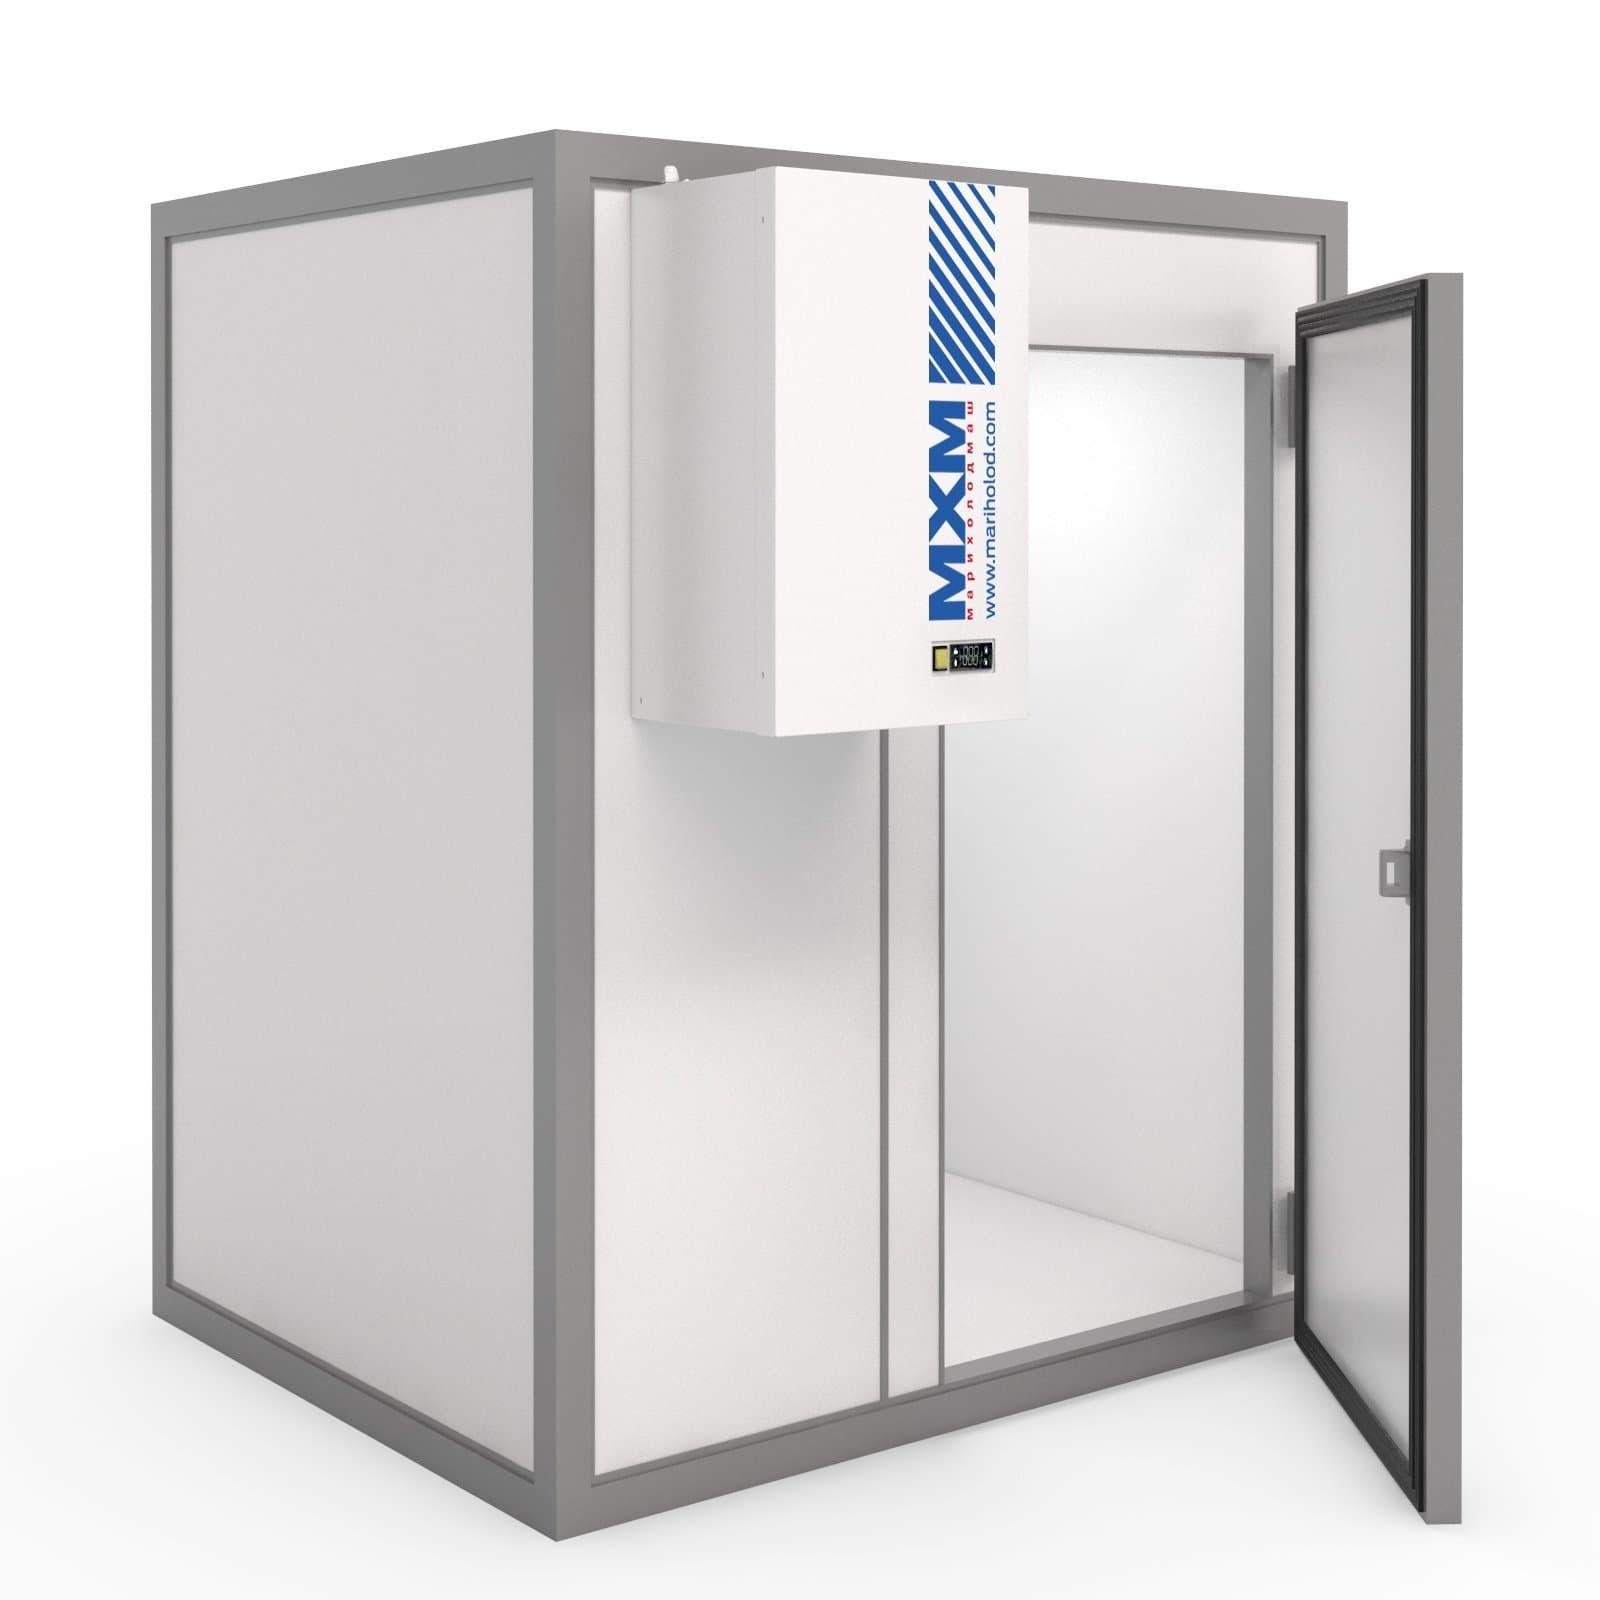 Камера холодильная МХМ КХН-42,23 1360×15460×2460